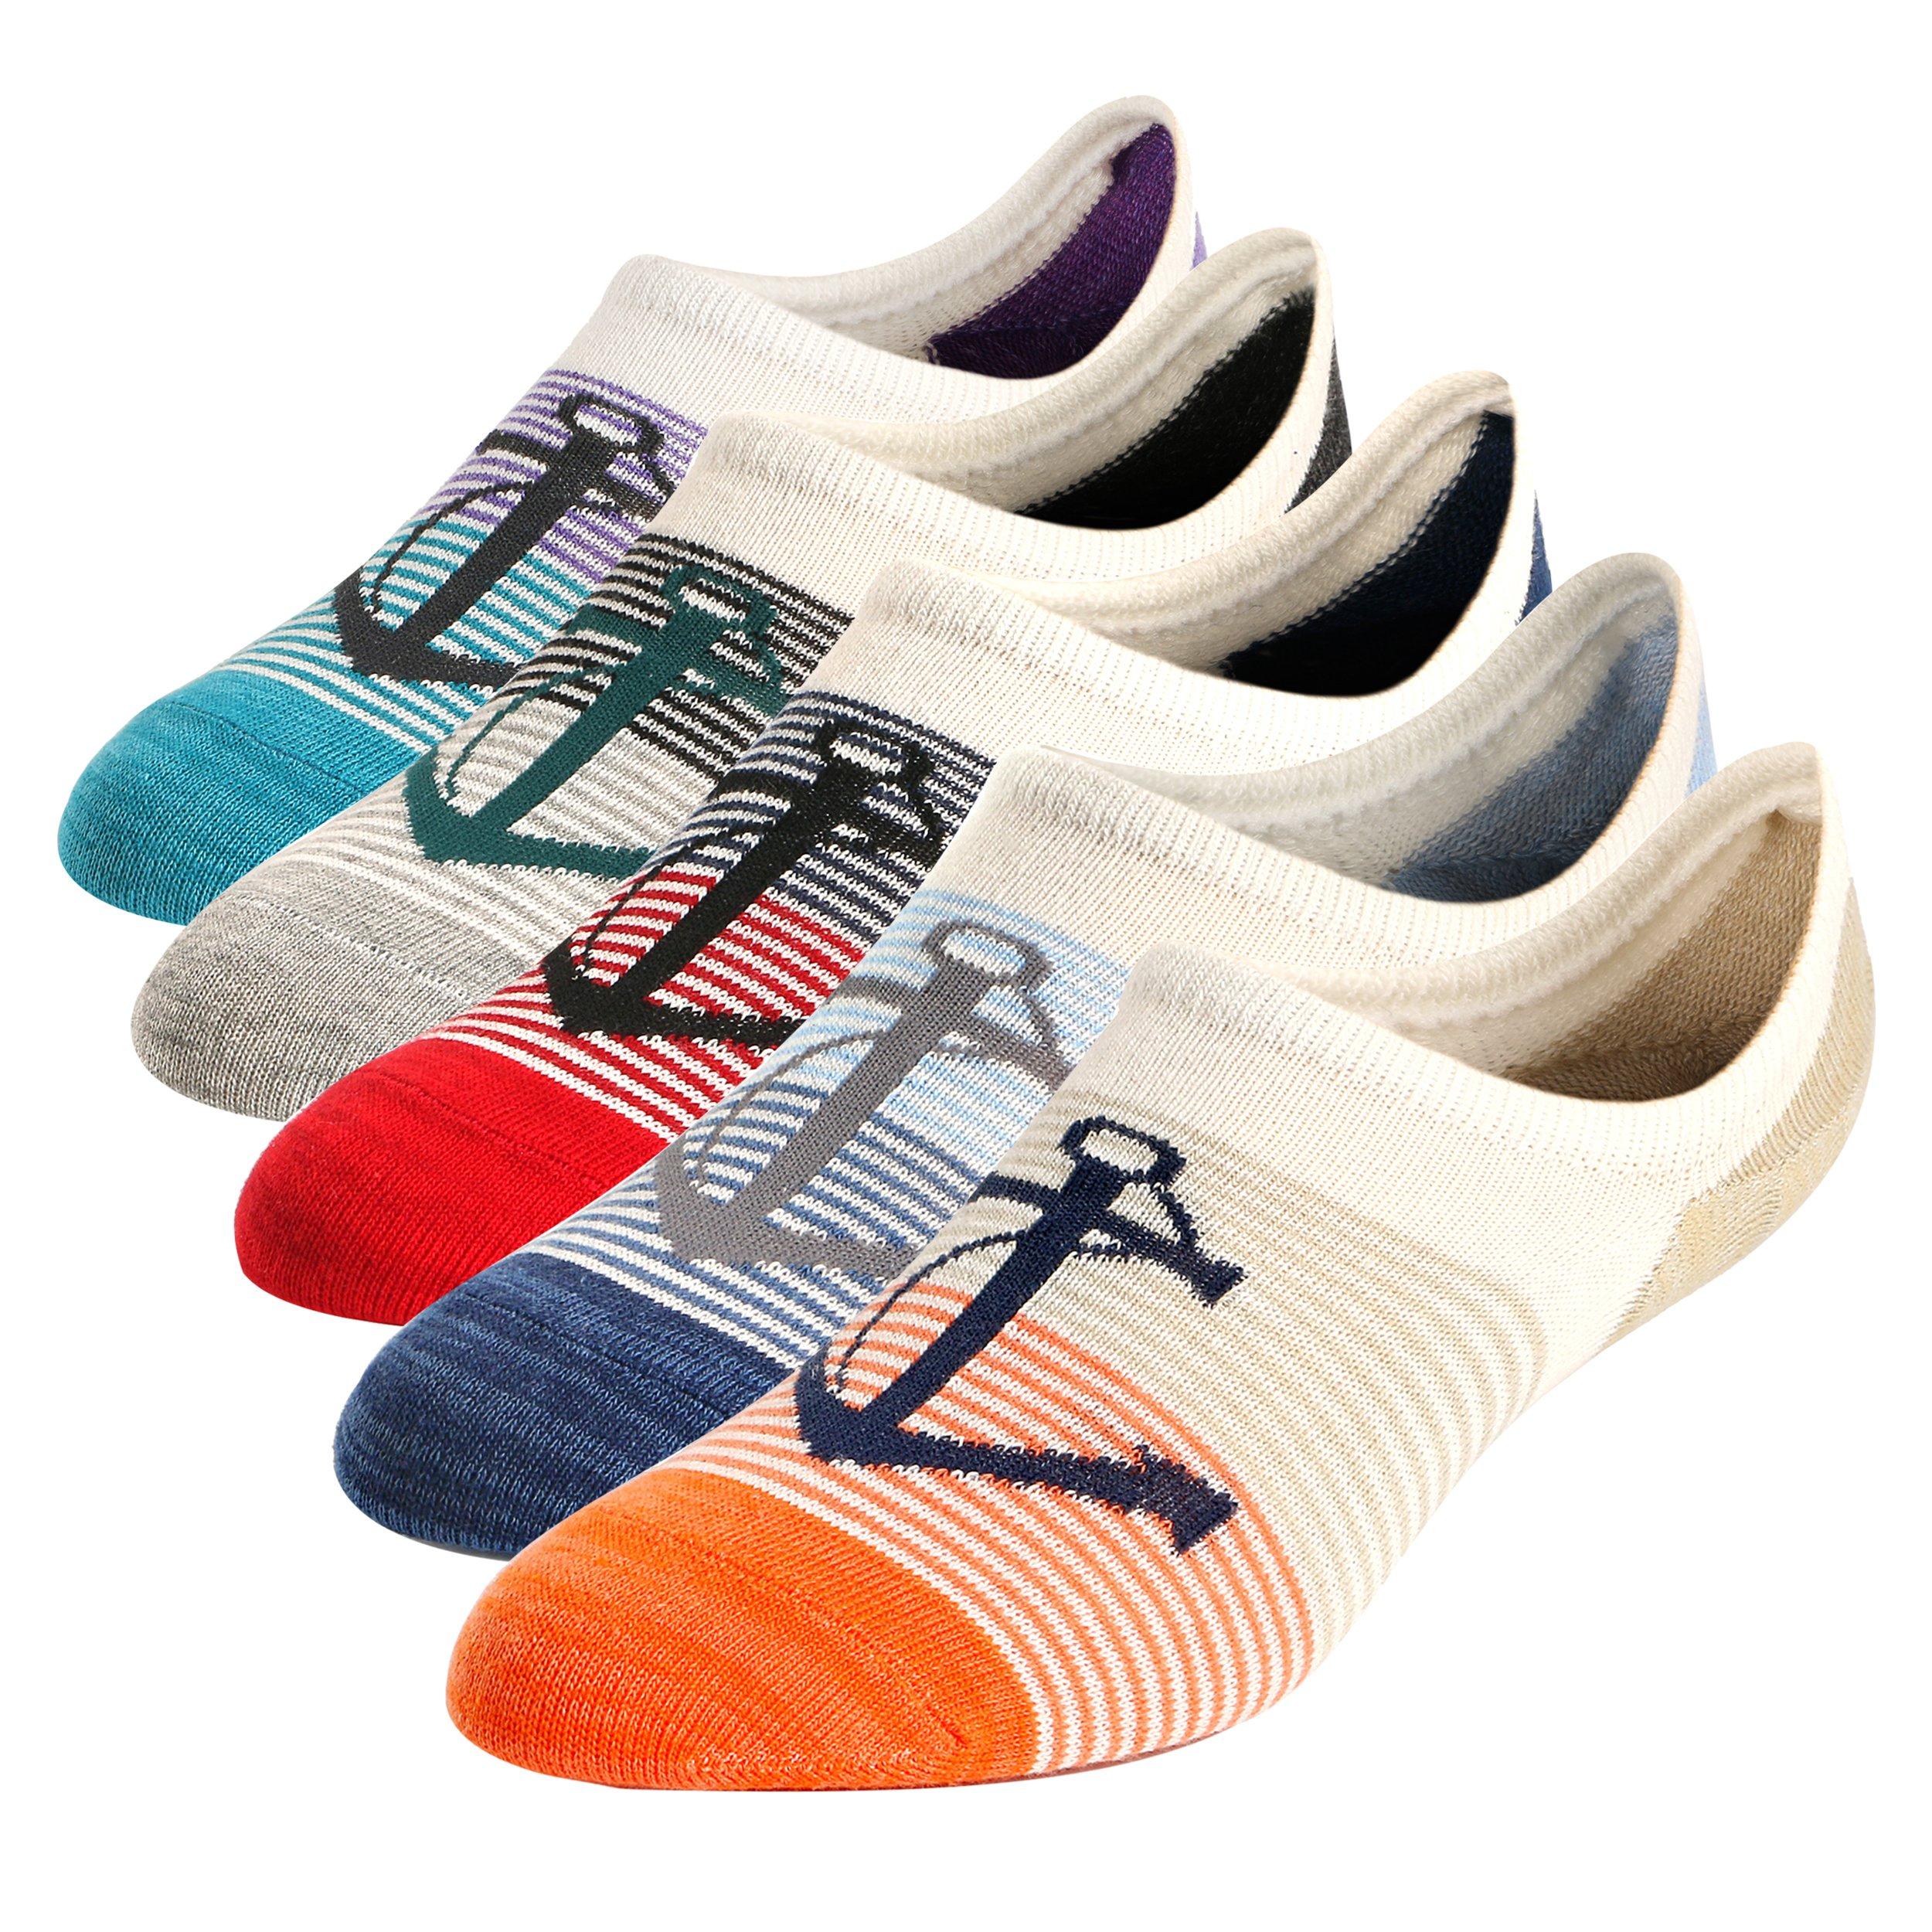 Mens No Show Low Cut Ankle Socks Non-Slip Ventilation Deodorant Boat Anchor Cotton Socks 5Pack